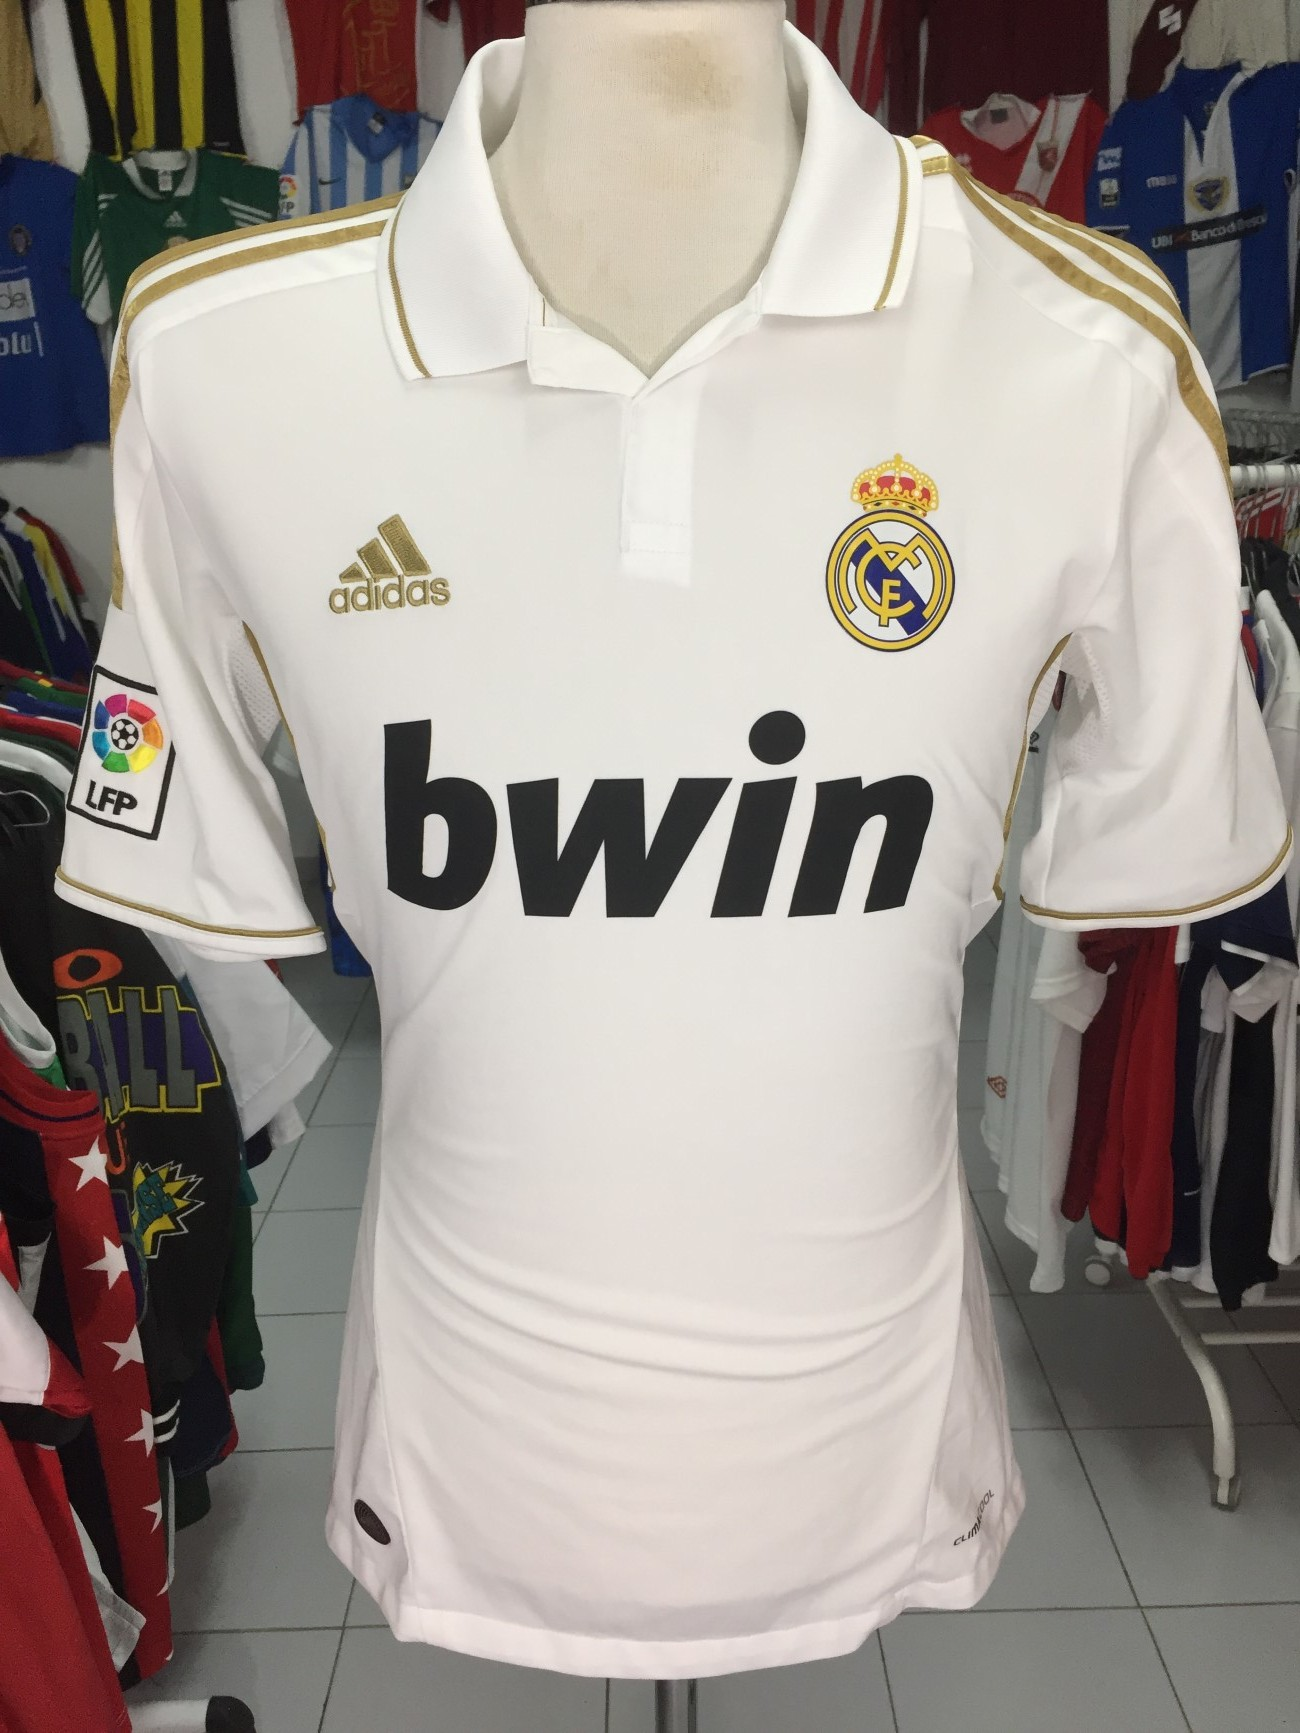 on sale c7669 6d59a Real Madrid Home Shirt 2011-12 (M) Camiseta Camisola Adidas | Vintage  Sports Classic Football Shirts Jerseys Camisolas Futebol NBA